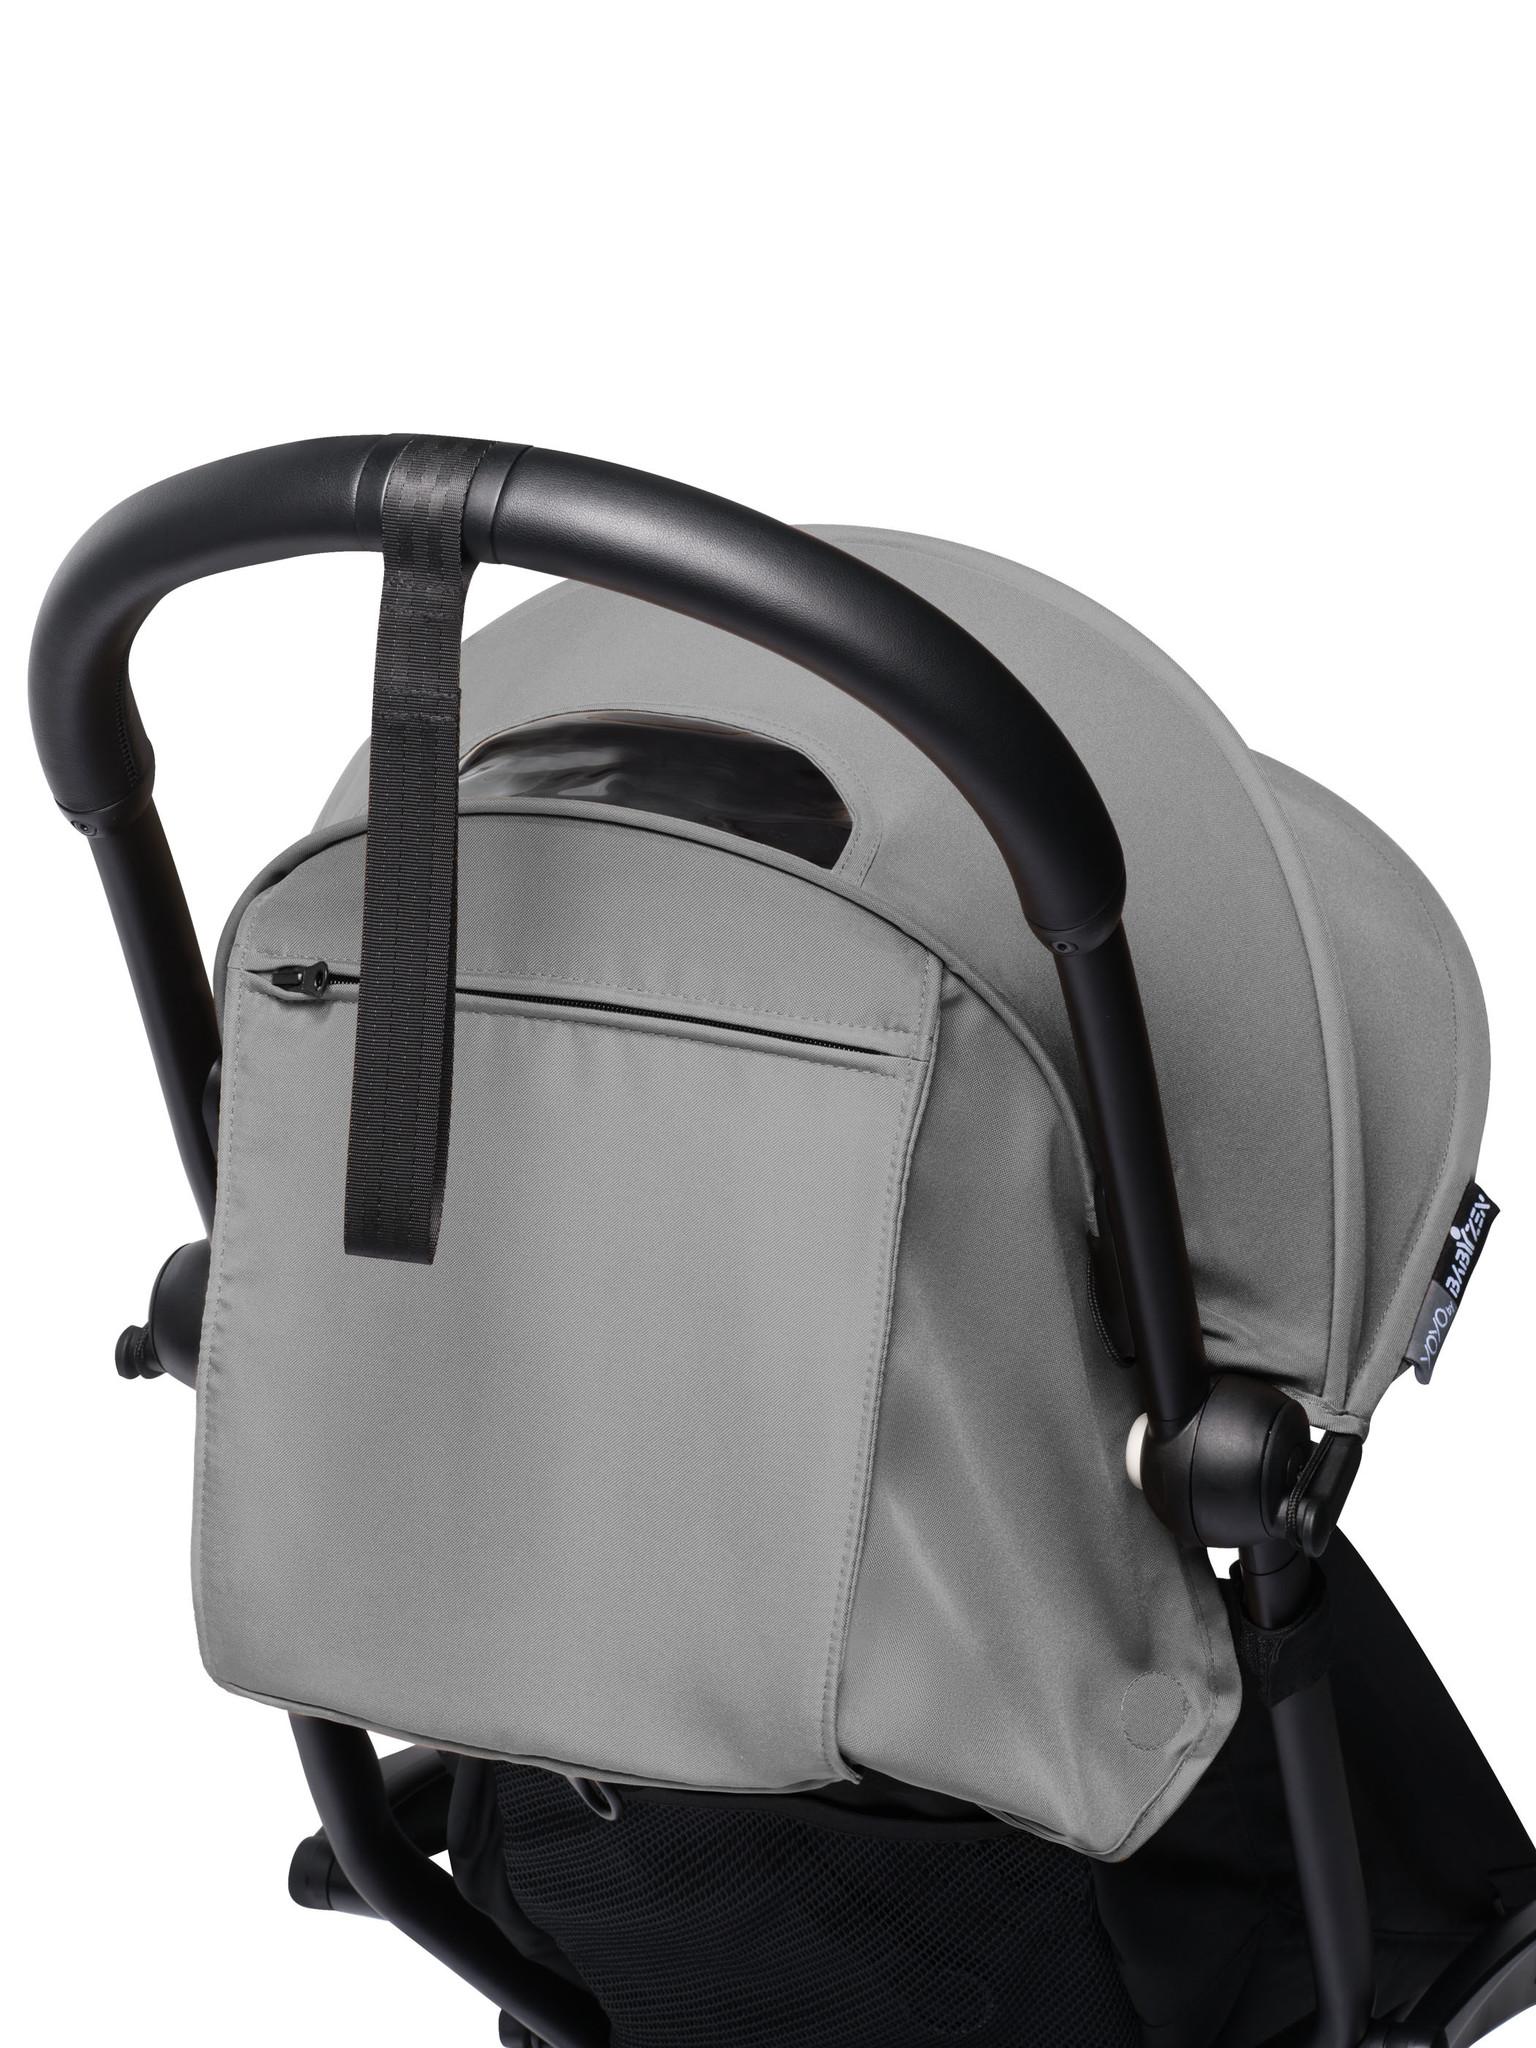 Babyzen Babyzen YOYO² buggy COMPLEET / FULL SET 0+ and 6+ grijs frame zwart incl. YOYO² BeSafe autostoel zwart